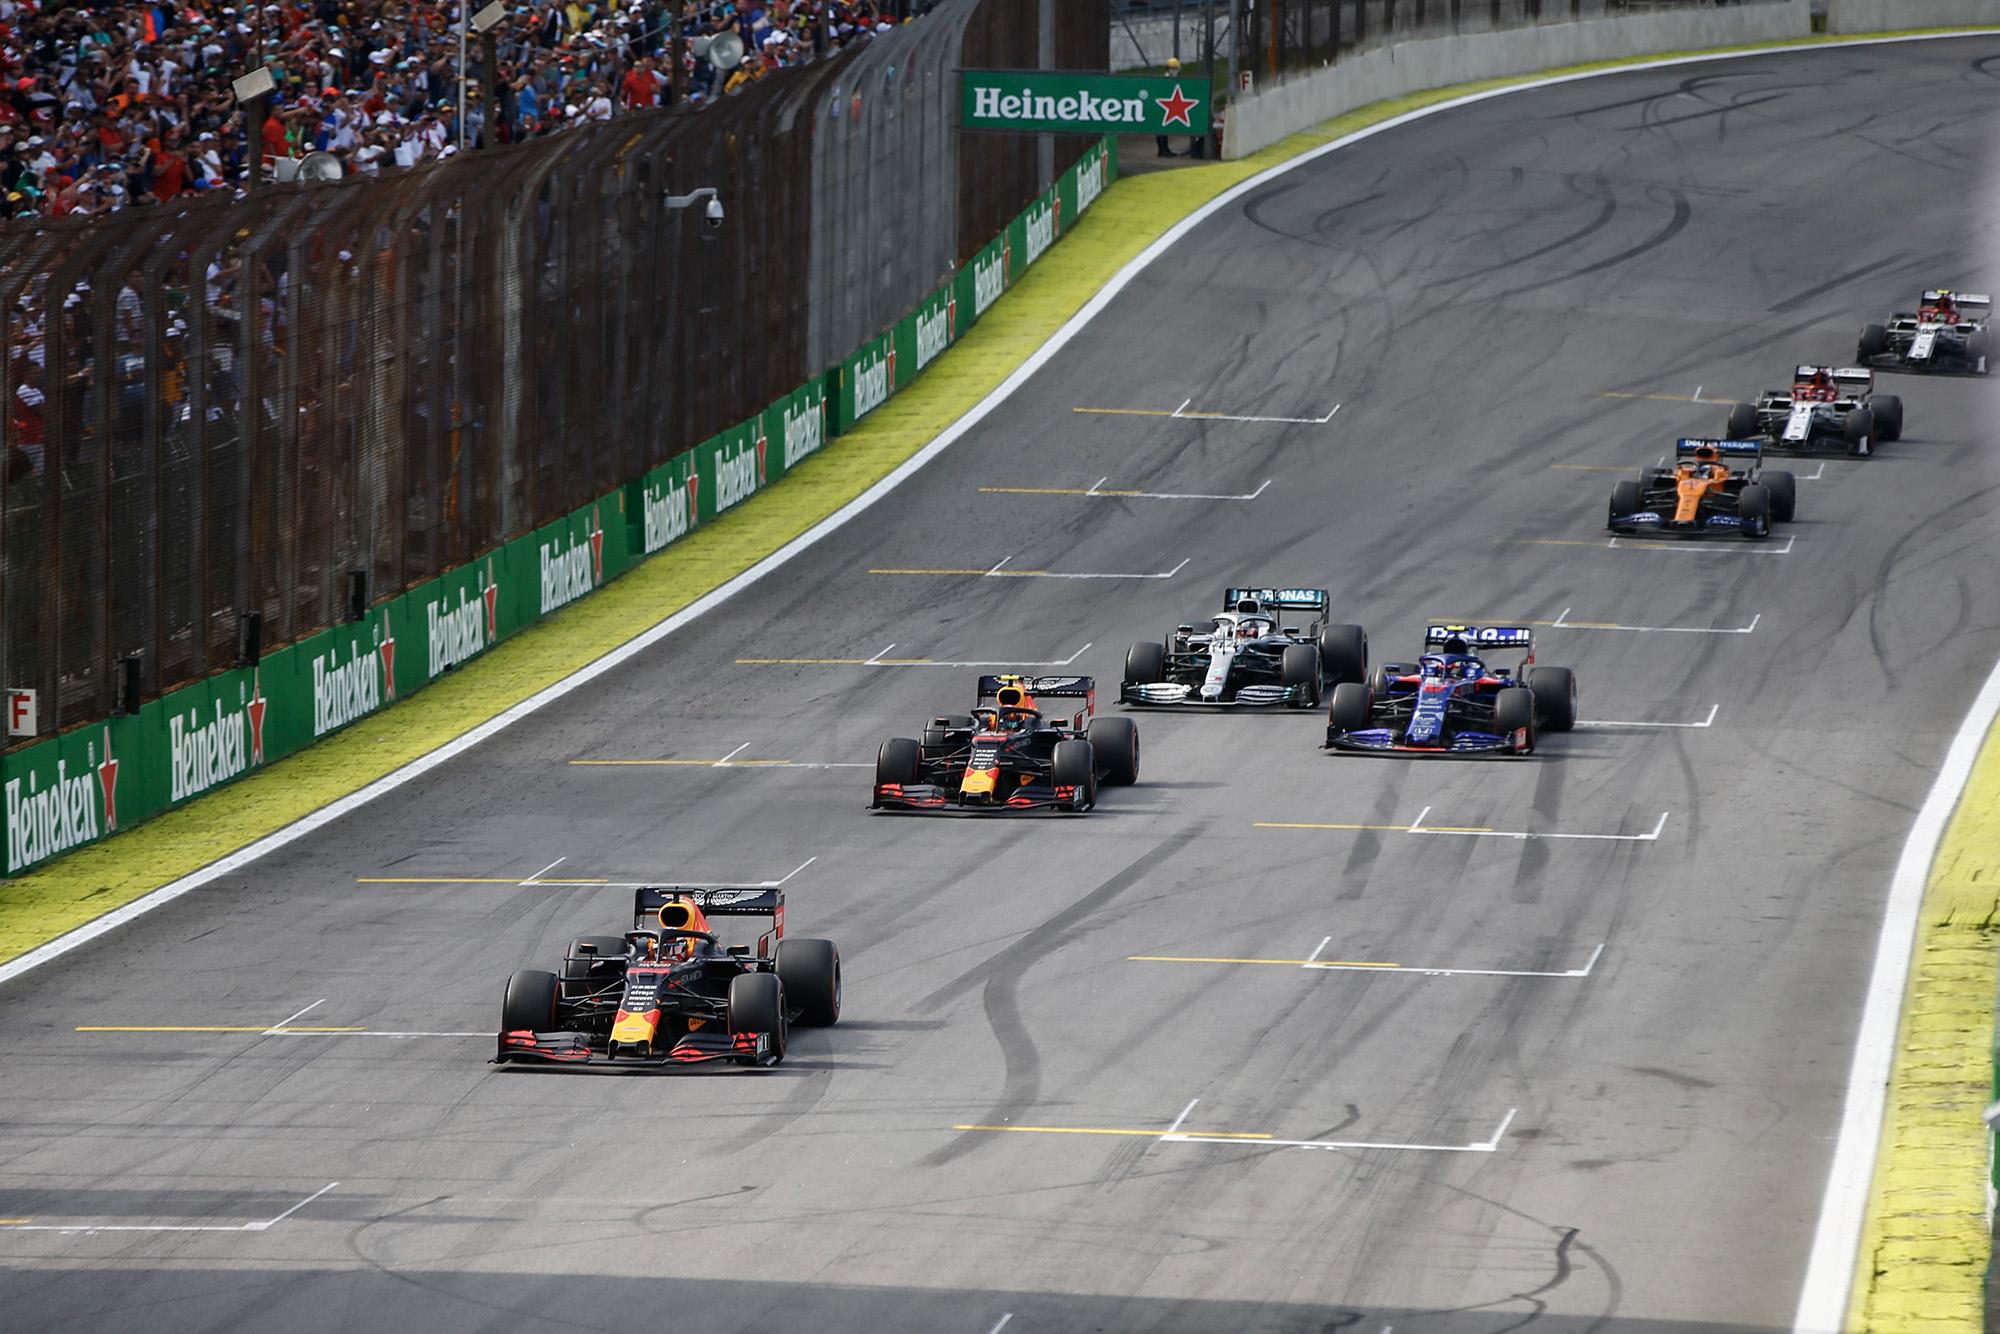 Max Verstappen leads at the final restart during the 2019 Brazilian Grand Prix